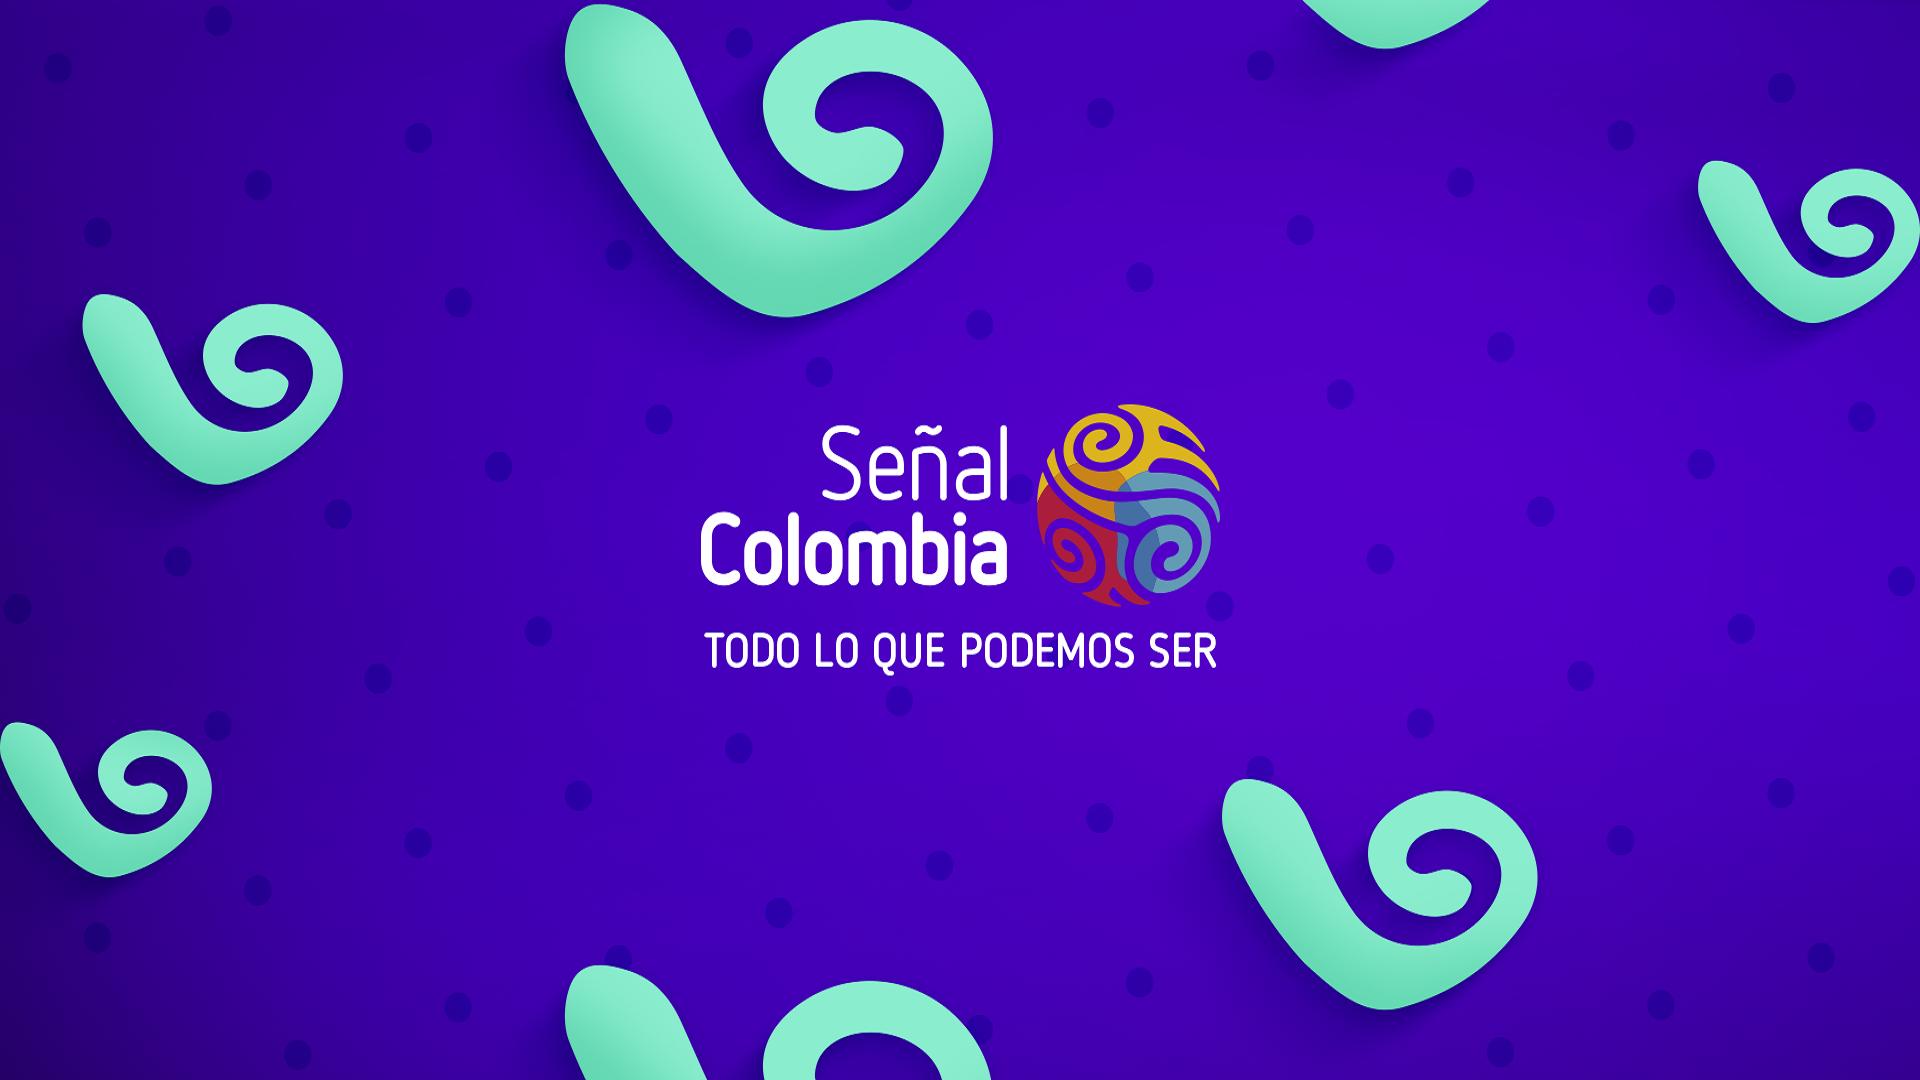 Se al colombia for Perdida de senal tv